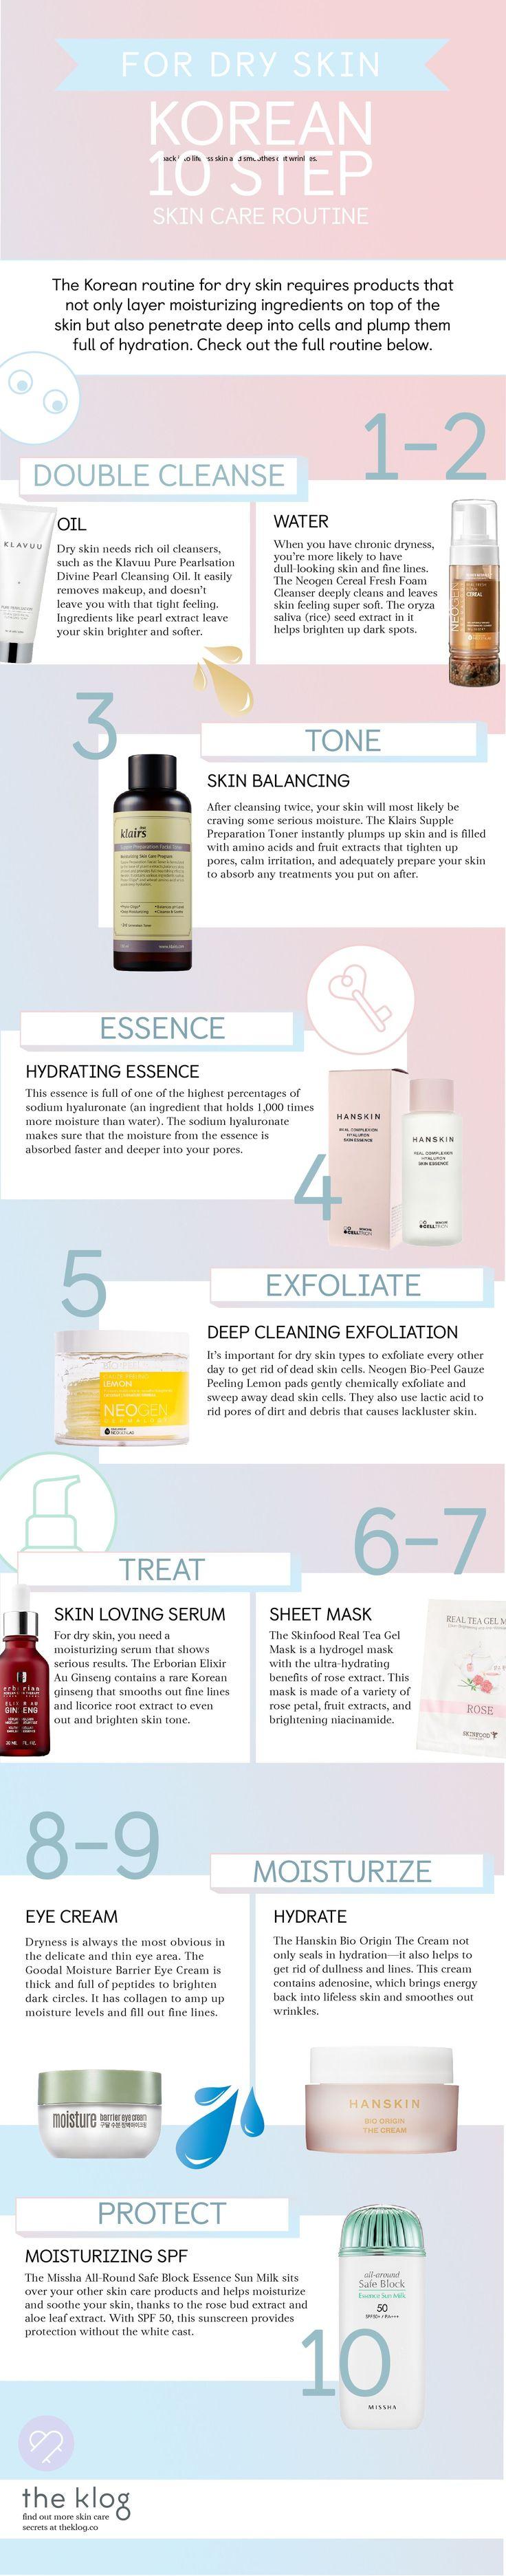 Korean 10 steps Skin Care Routine for Dry Skin